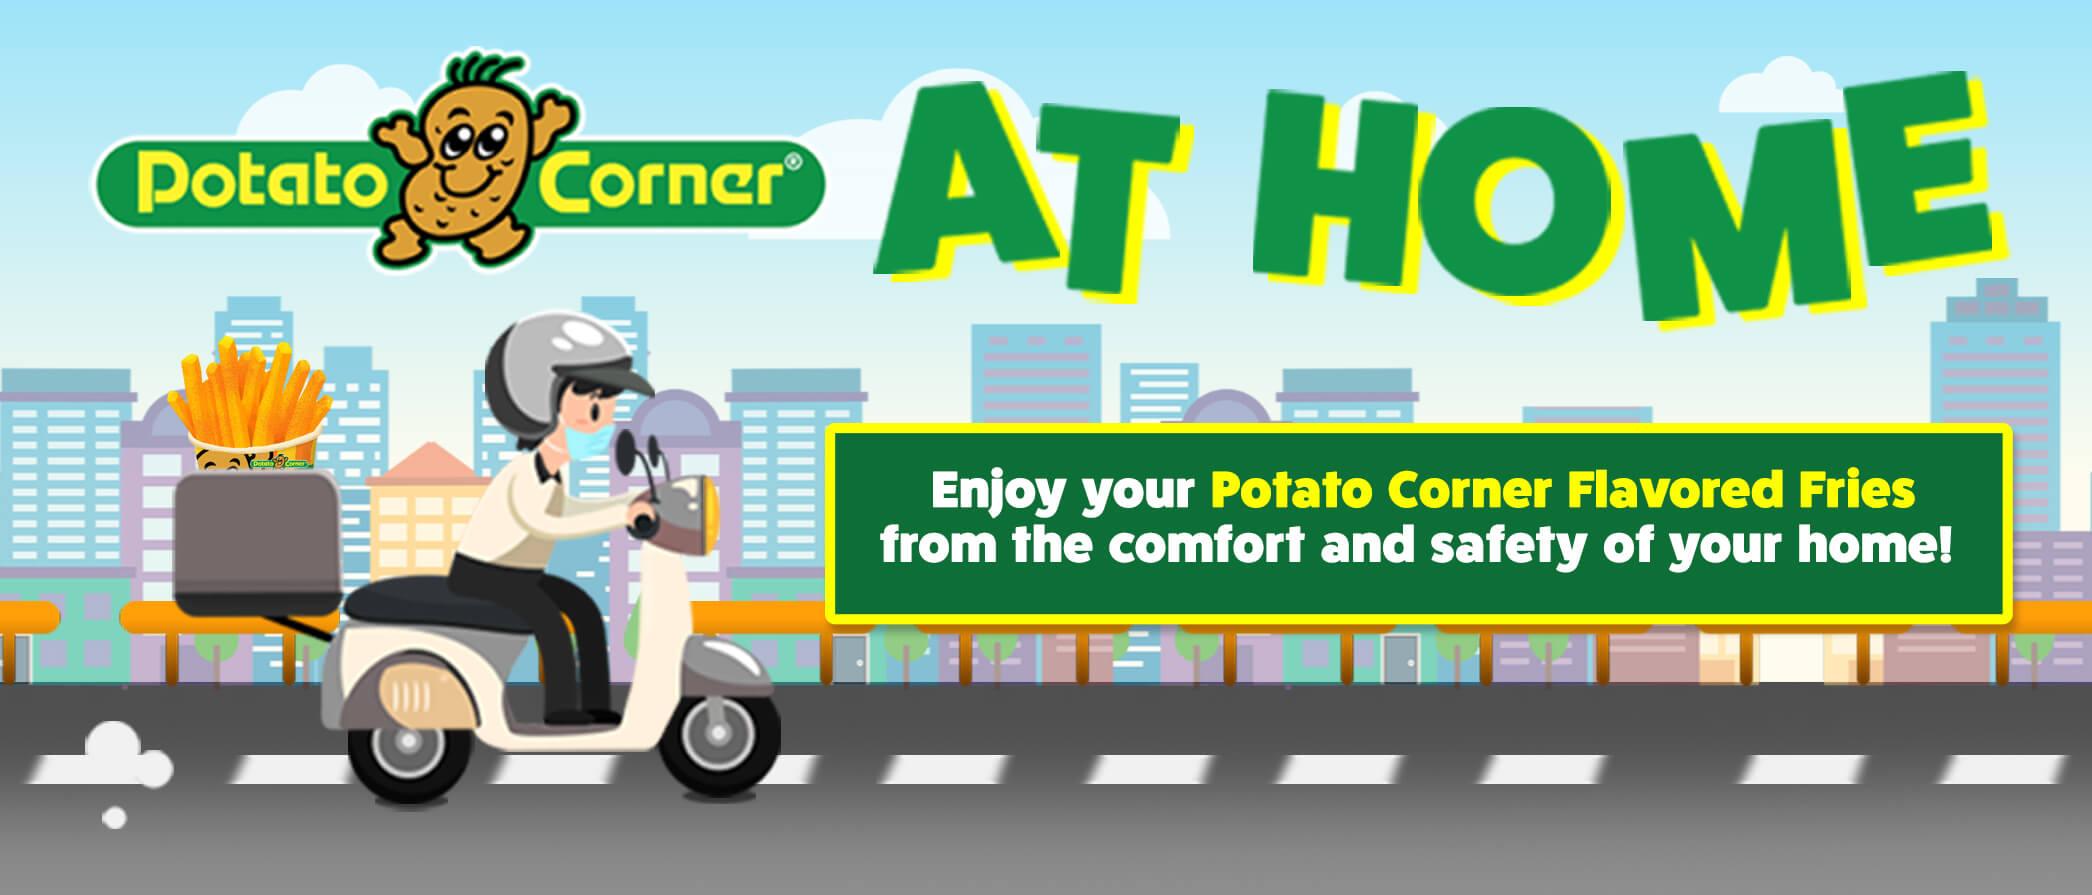 potatocorner-banner